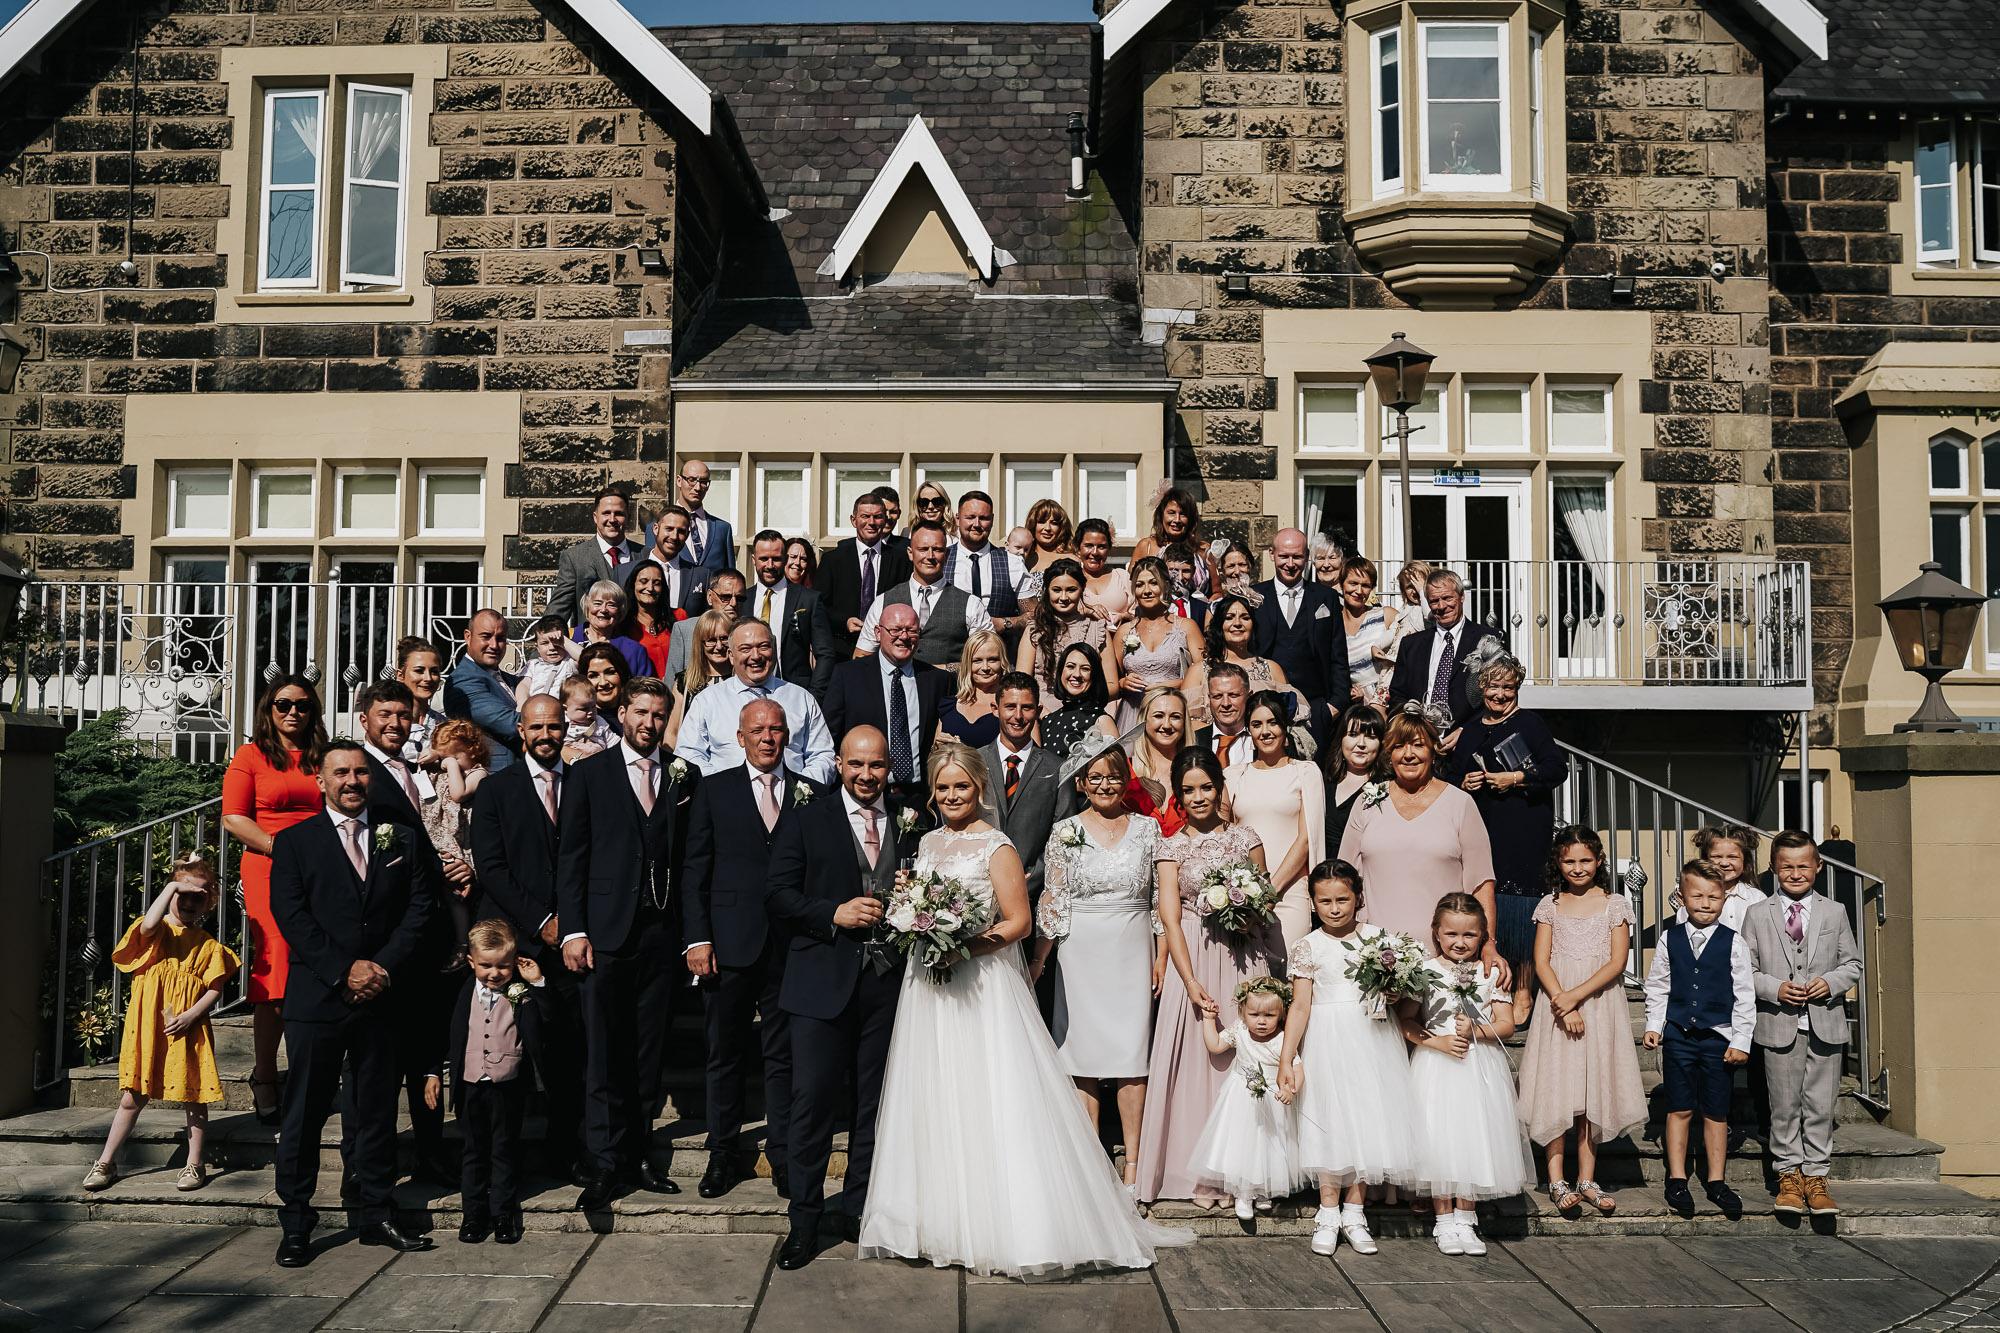 West Tower Wedding Photographer Ormskirk Lancashire wedding photography (26 of 57).jpg